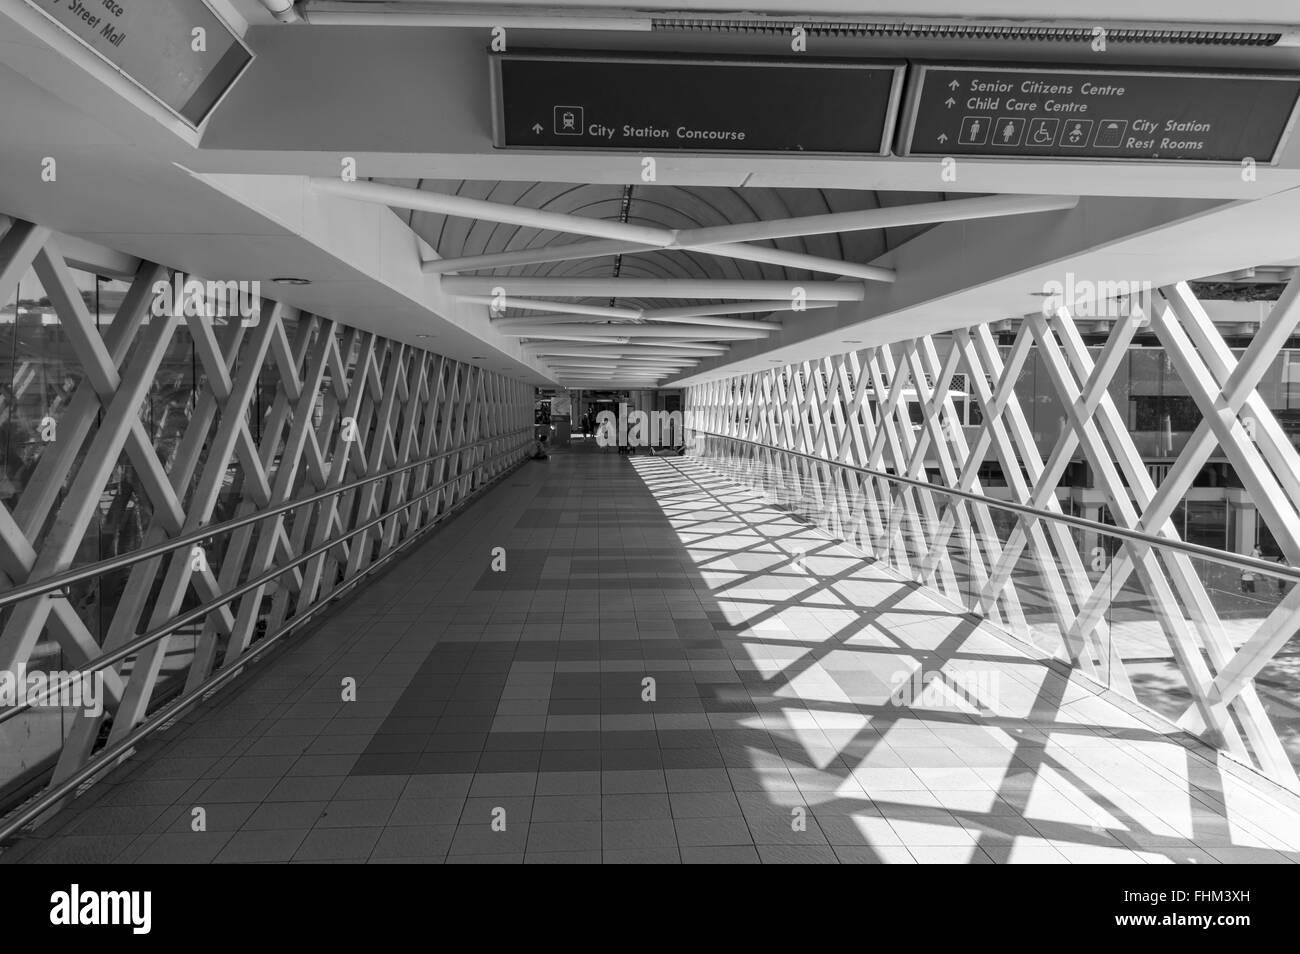 Pedestrian arcade connecting Perth train station with the city center. Perth, Western Australia, Australia. - Stock Image